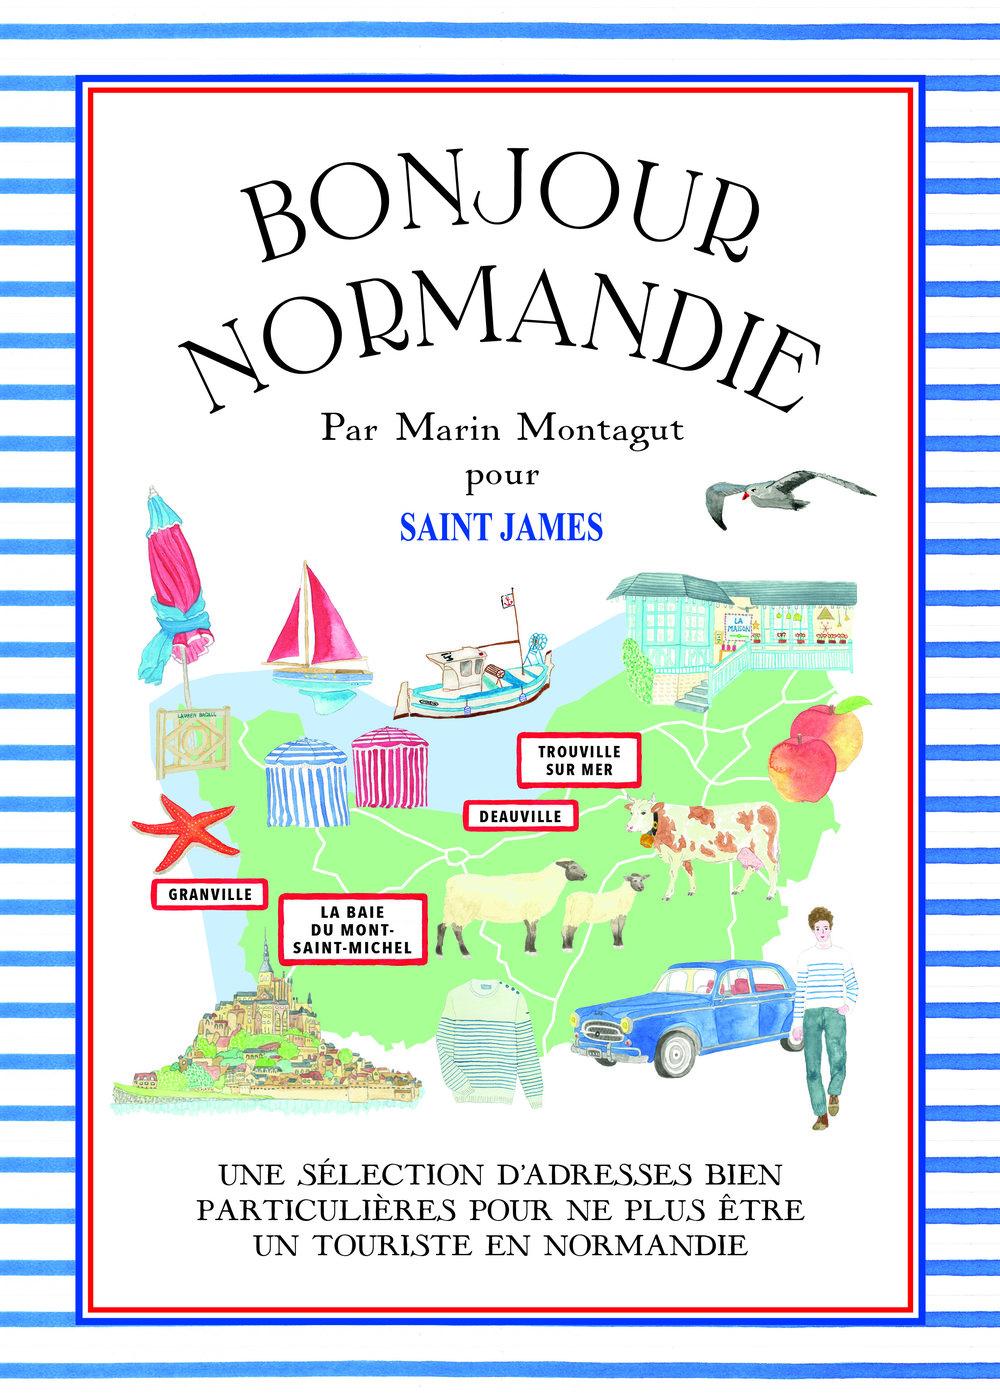 BONJOUR_NORMANDIE_COUV_170314_apercu_AN_FR.jpg